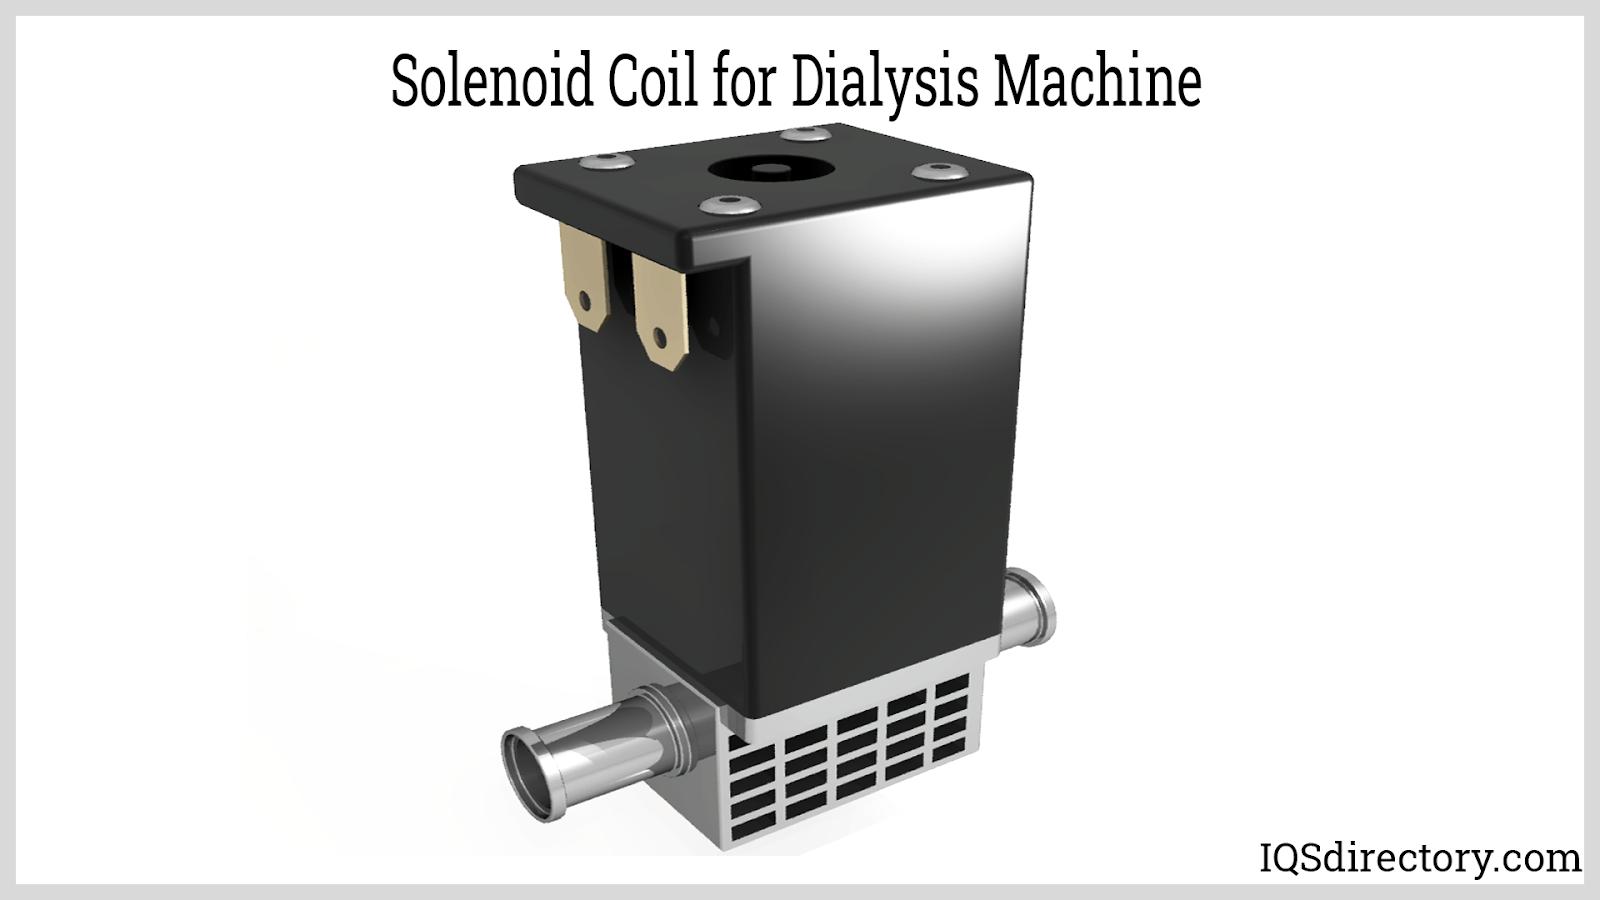 Solenoid Coil for Dialysis Machine